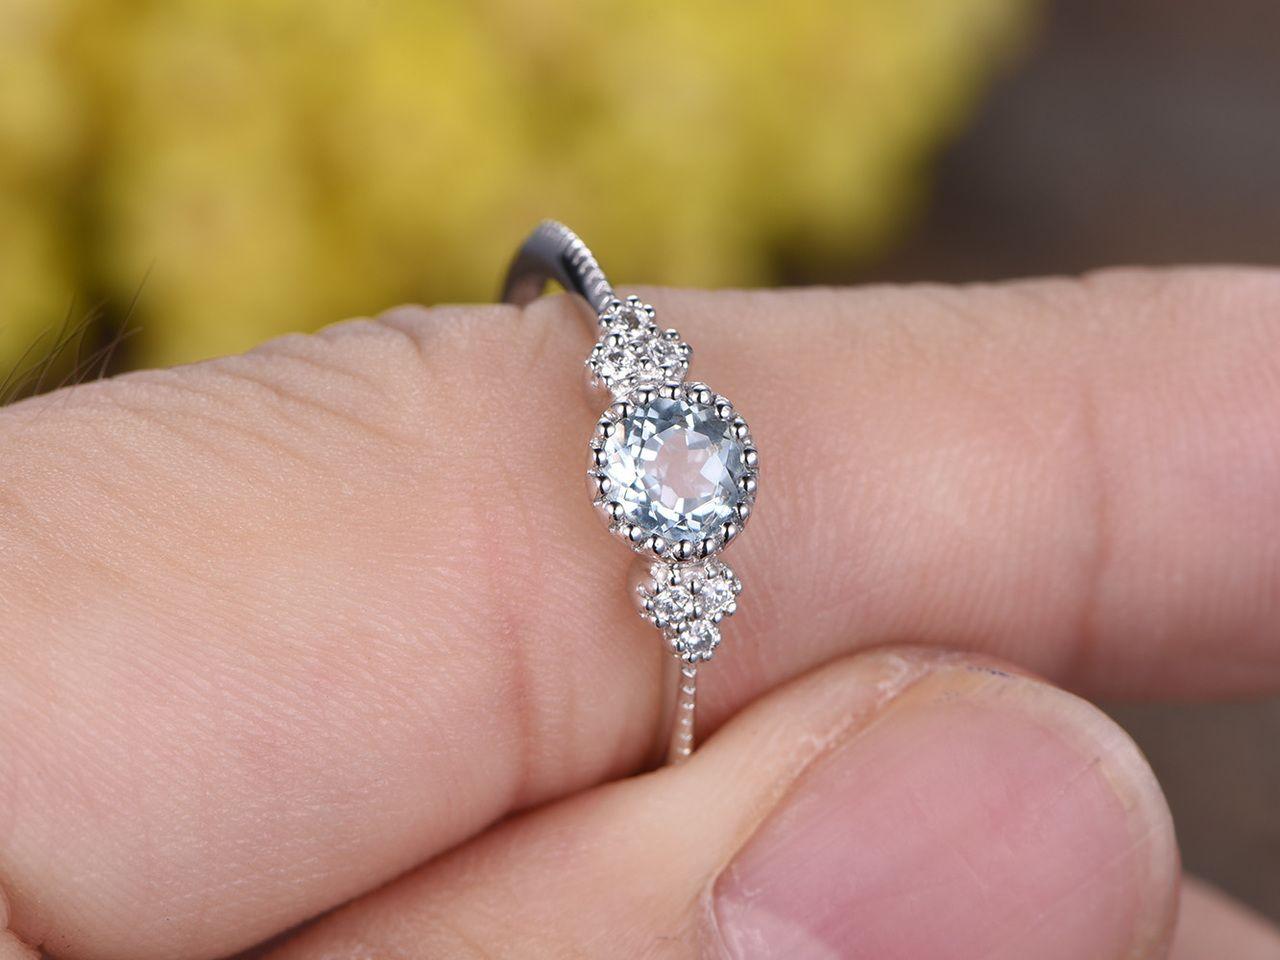 0.5 Carat Round Aquamarine Diamond Engagement Ring 14k White Gold ...